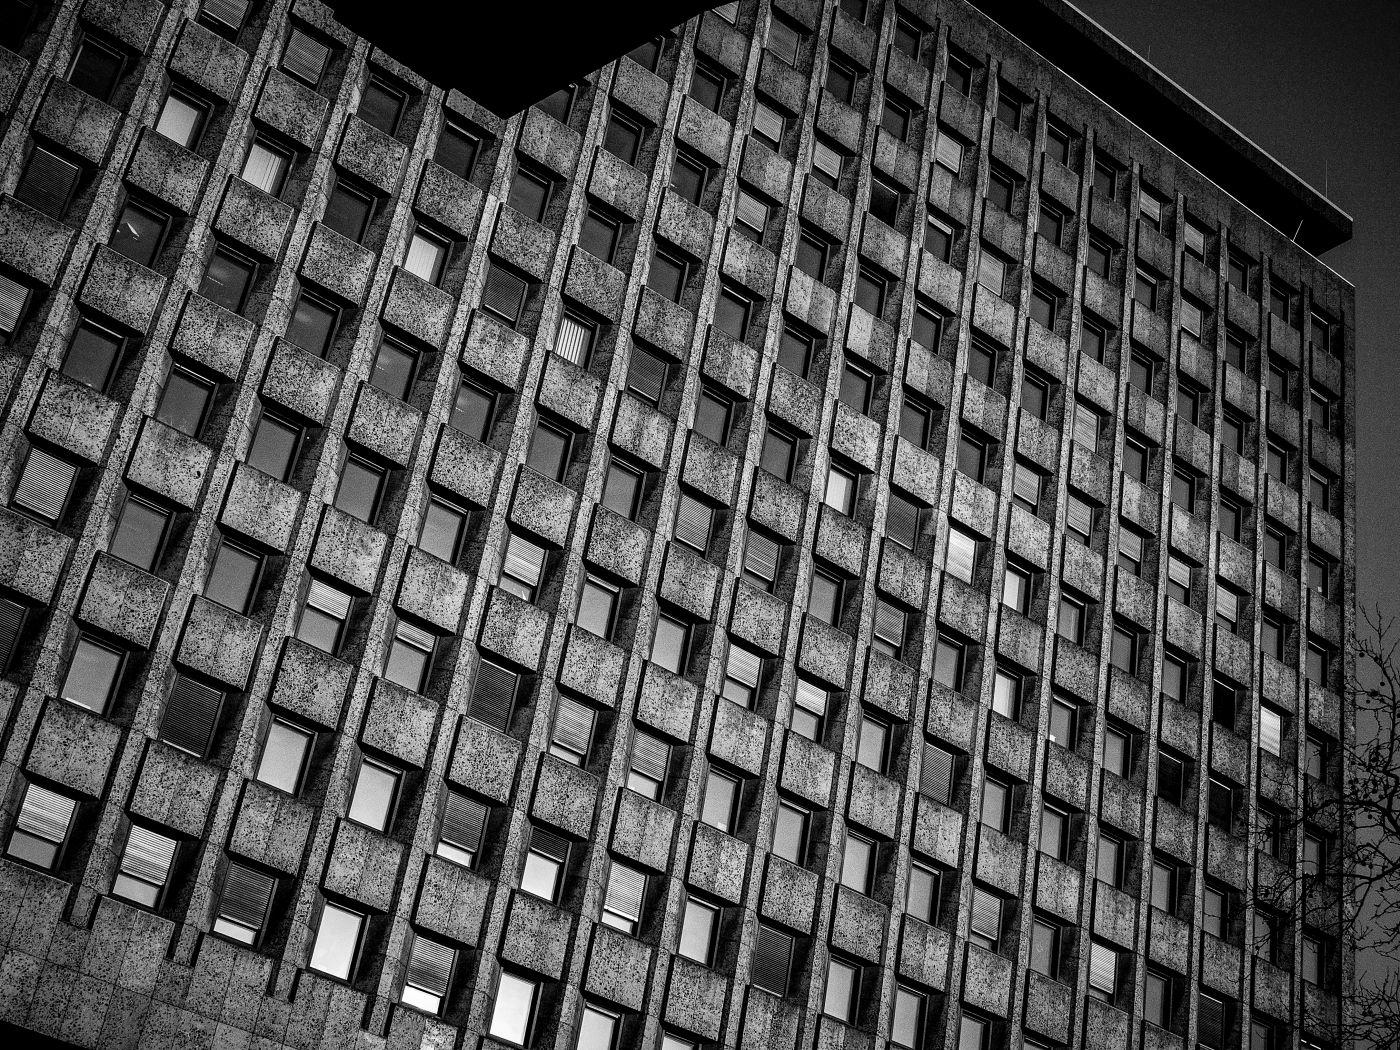 Köln, WDR